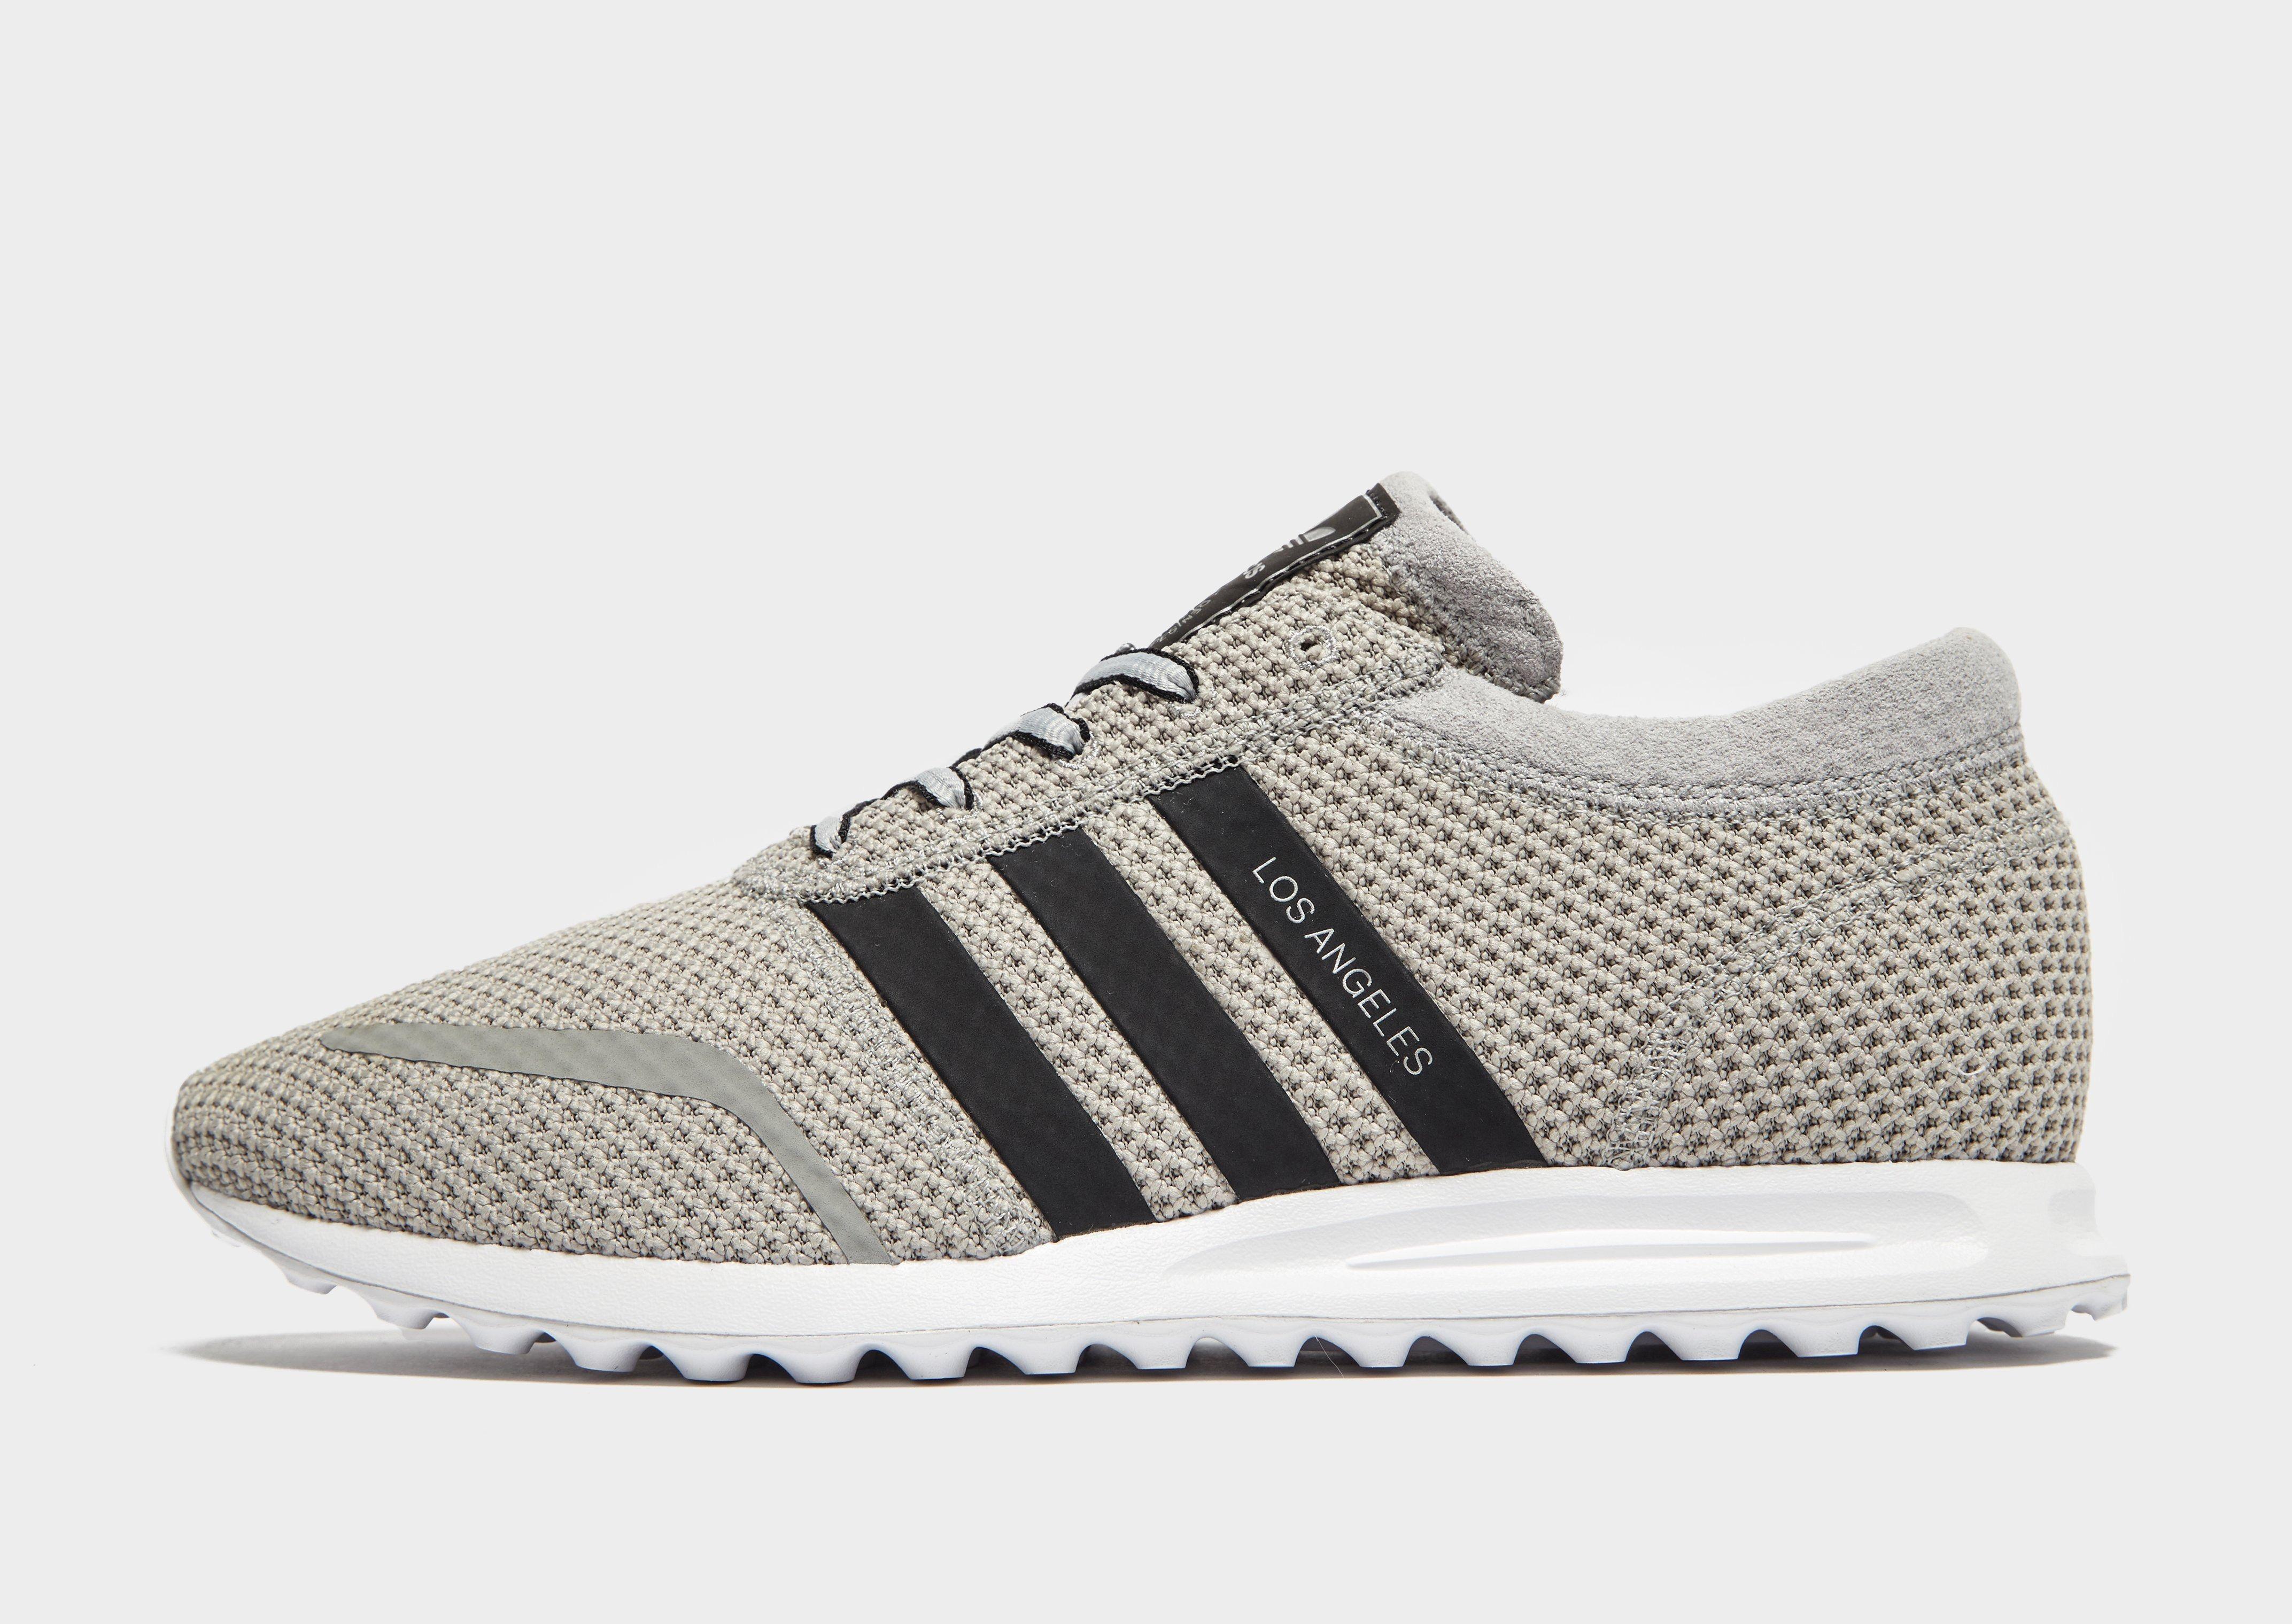 adidas kleding, schoenen en accessoires online bestellen